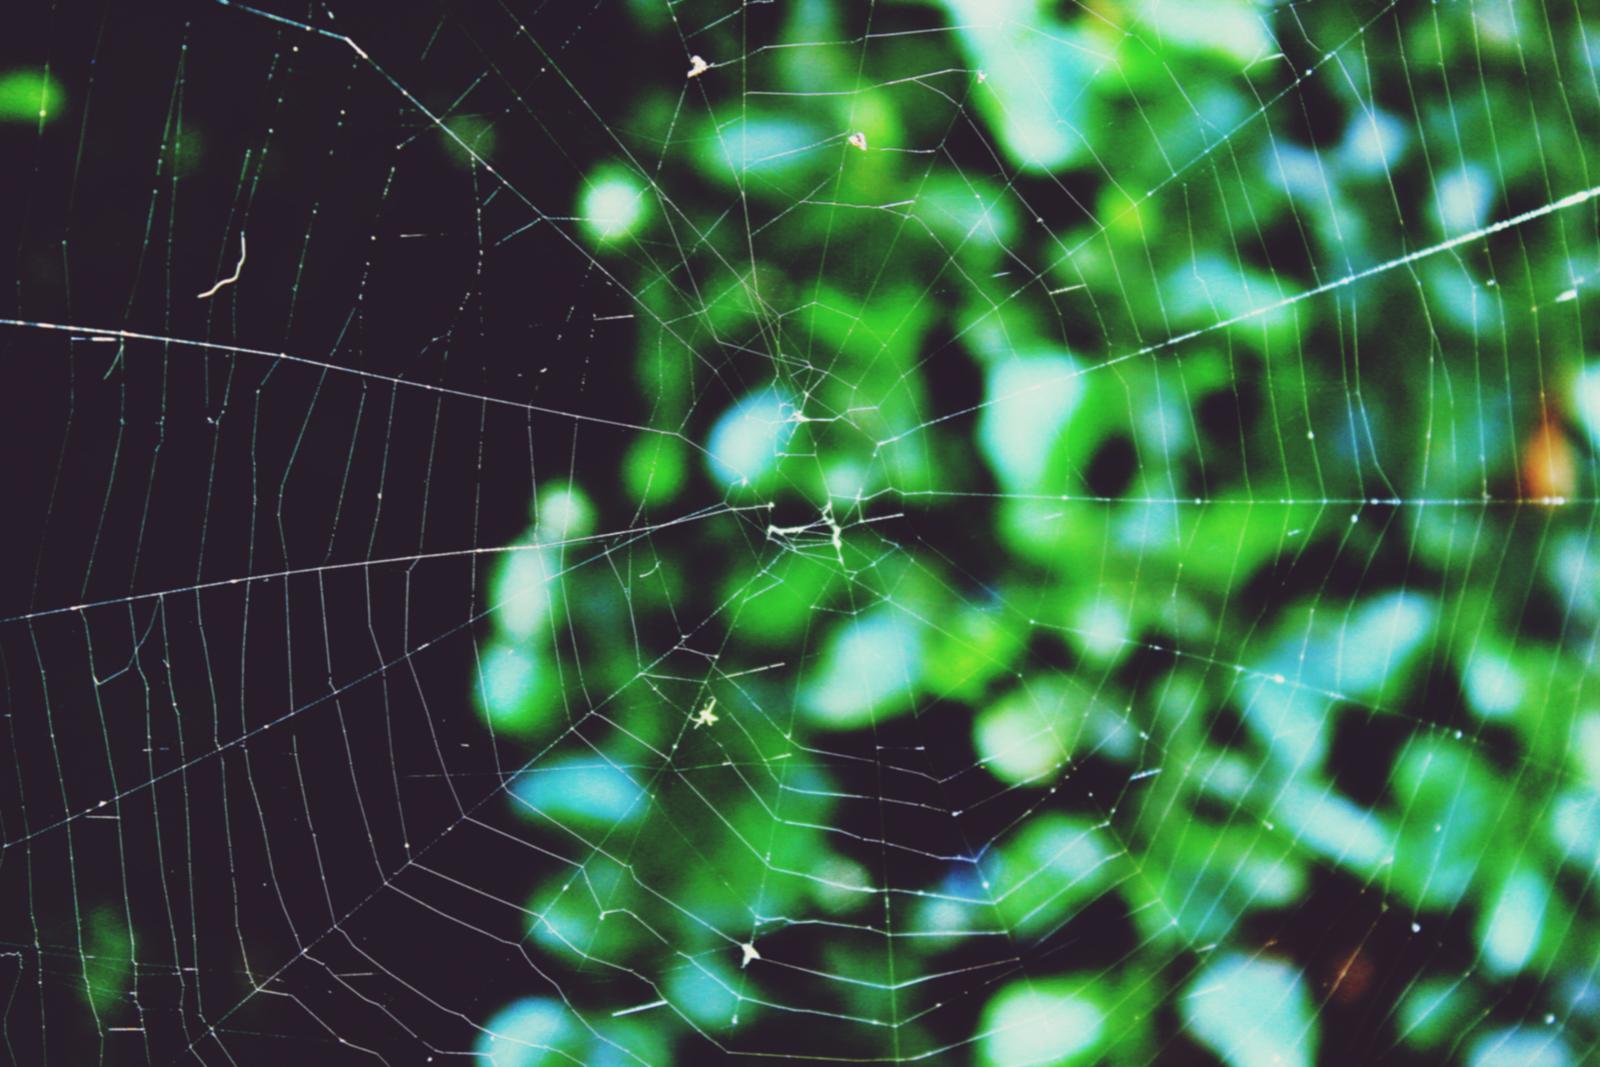 Spiderweb.jpeg